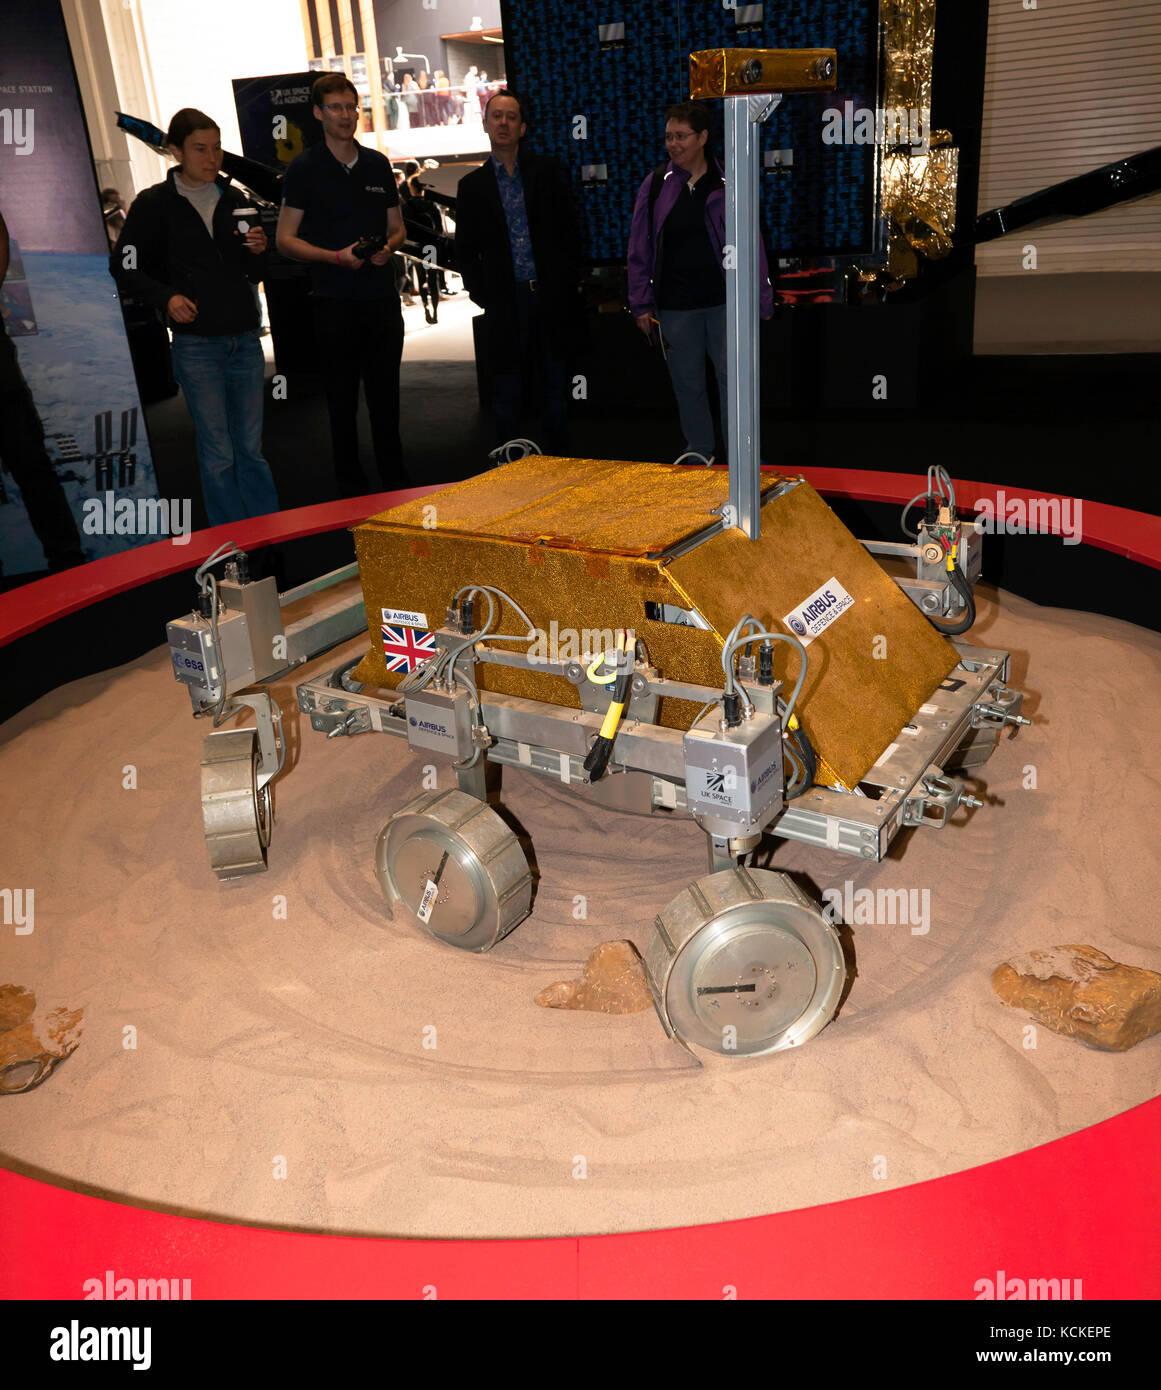 airbus mars rover name - photo #38